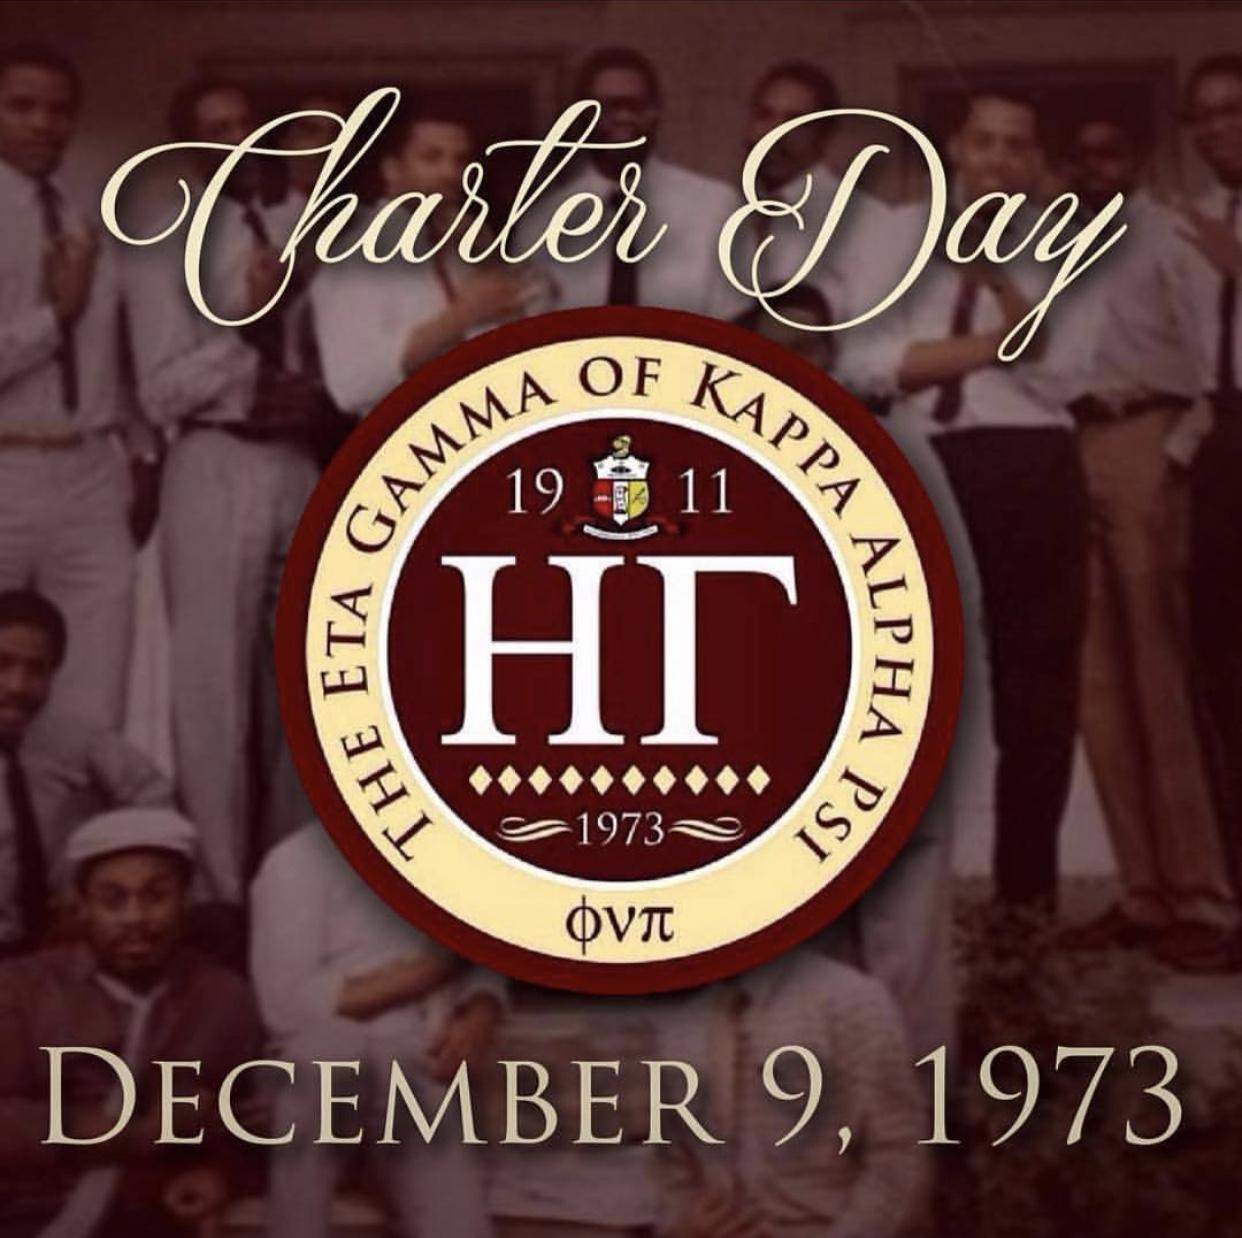 Eta Gamma Charter Day - December 9, 1973